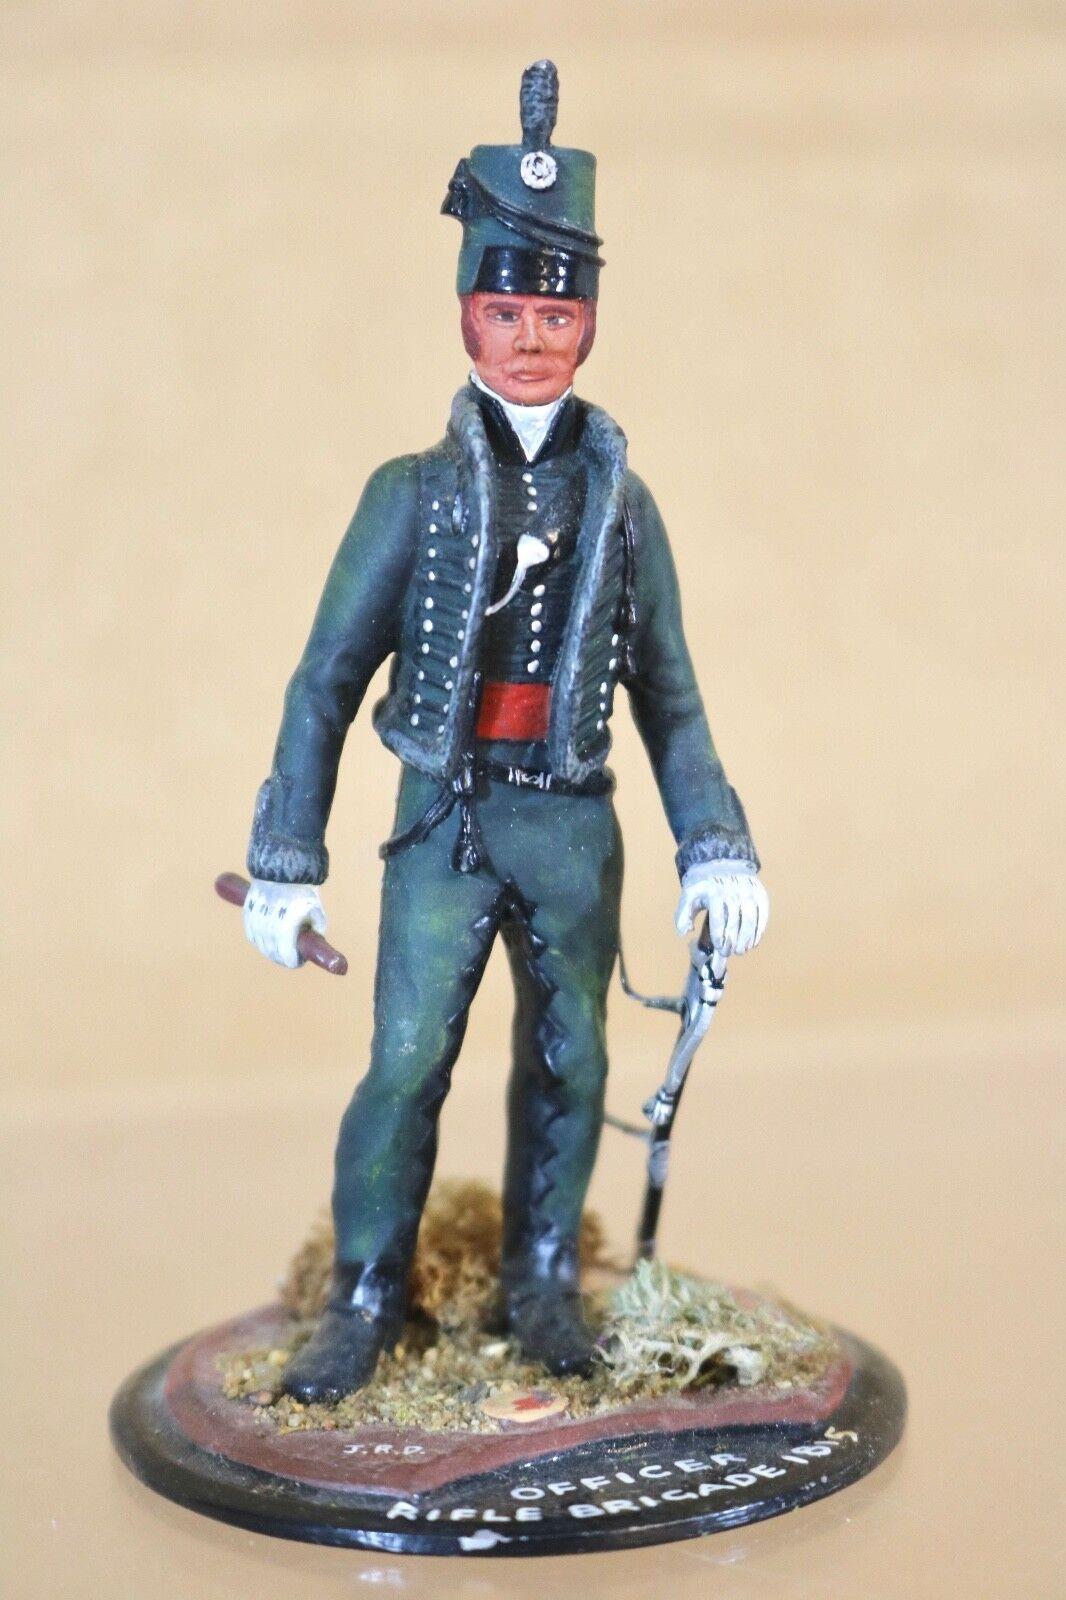 SERIES 77 90mm NAPOLEONIC BRITISH RIFLE BRIGADE OFFICER 1815 1815 1815 WATERLOO nn a5a